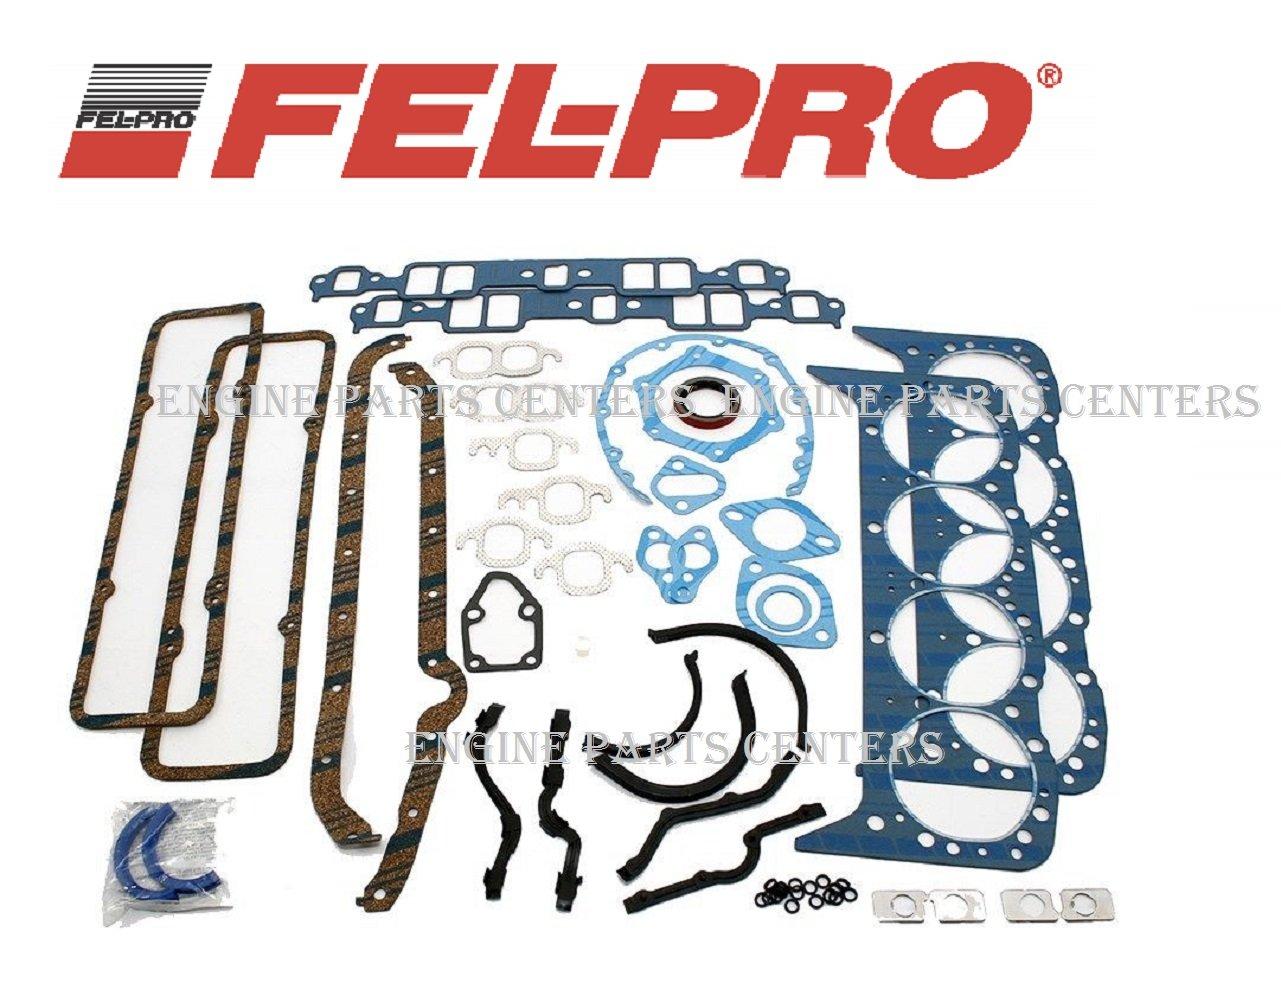 Fel Pro 260 1000 Small Block Chevy Overhaul Gasket Kit 350 Hei Distributor Rebuild 55 79 283 327 Sbc Stock Gskt Set Automotive